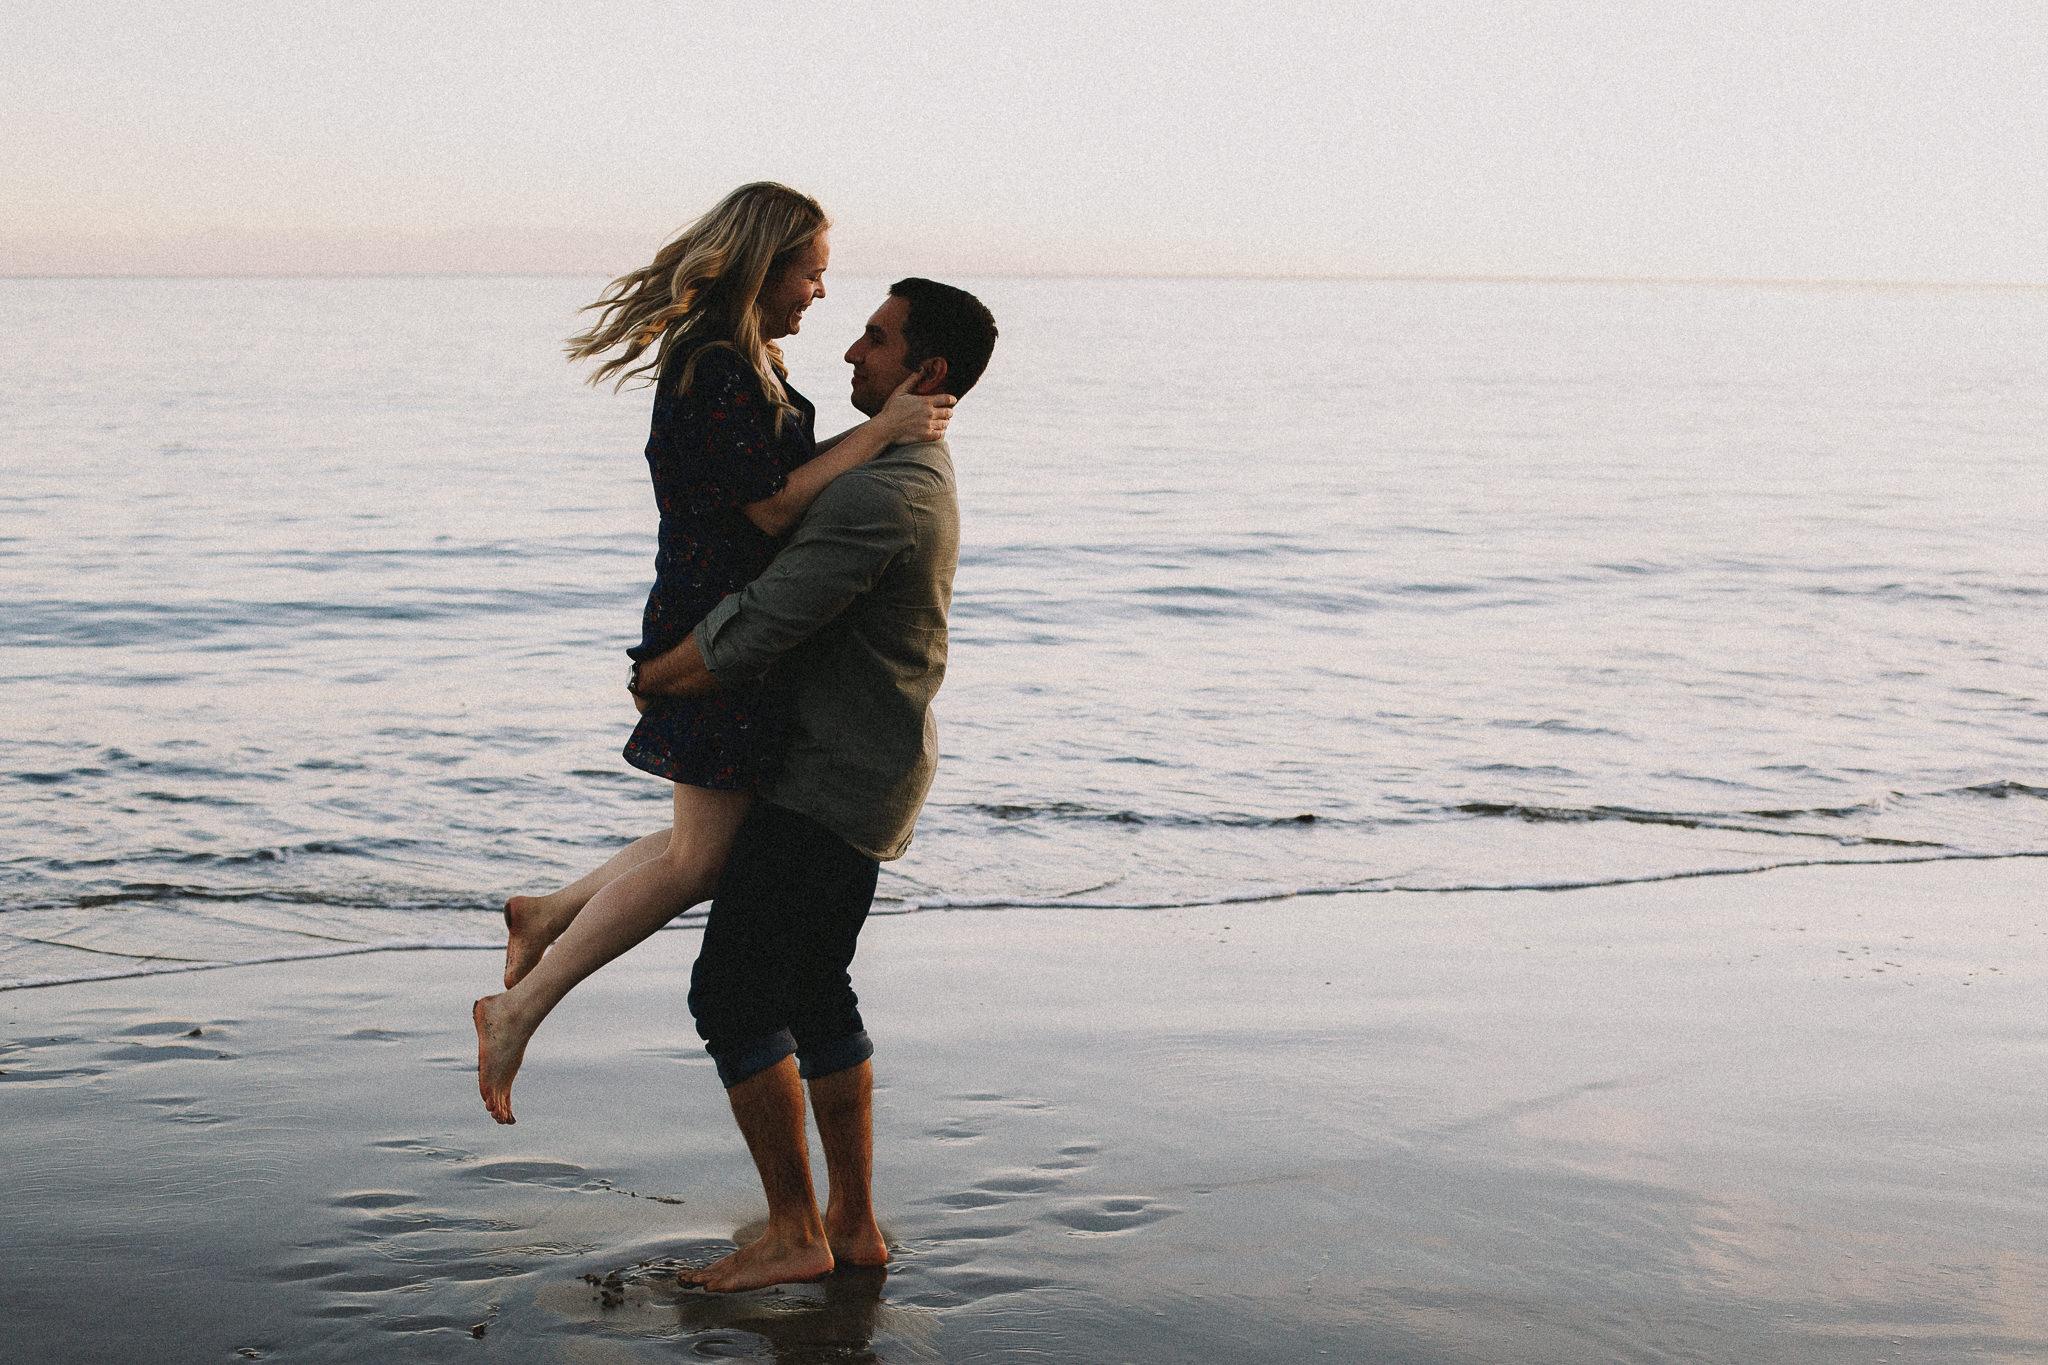 Archer Inspired Photography Capitola Beach Santa Cruz Wedding Engagement Lifestyle Session Photographer-104.jpg